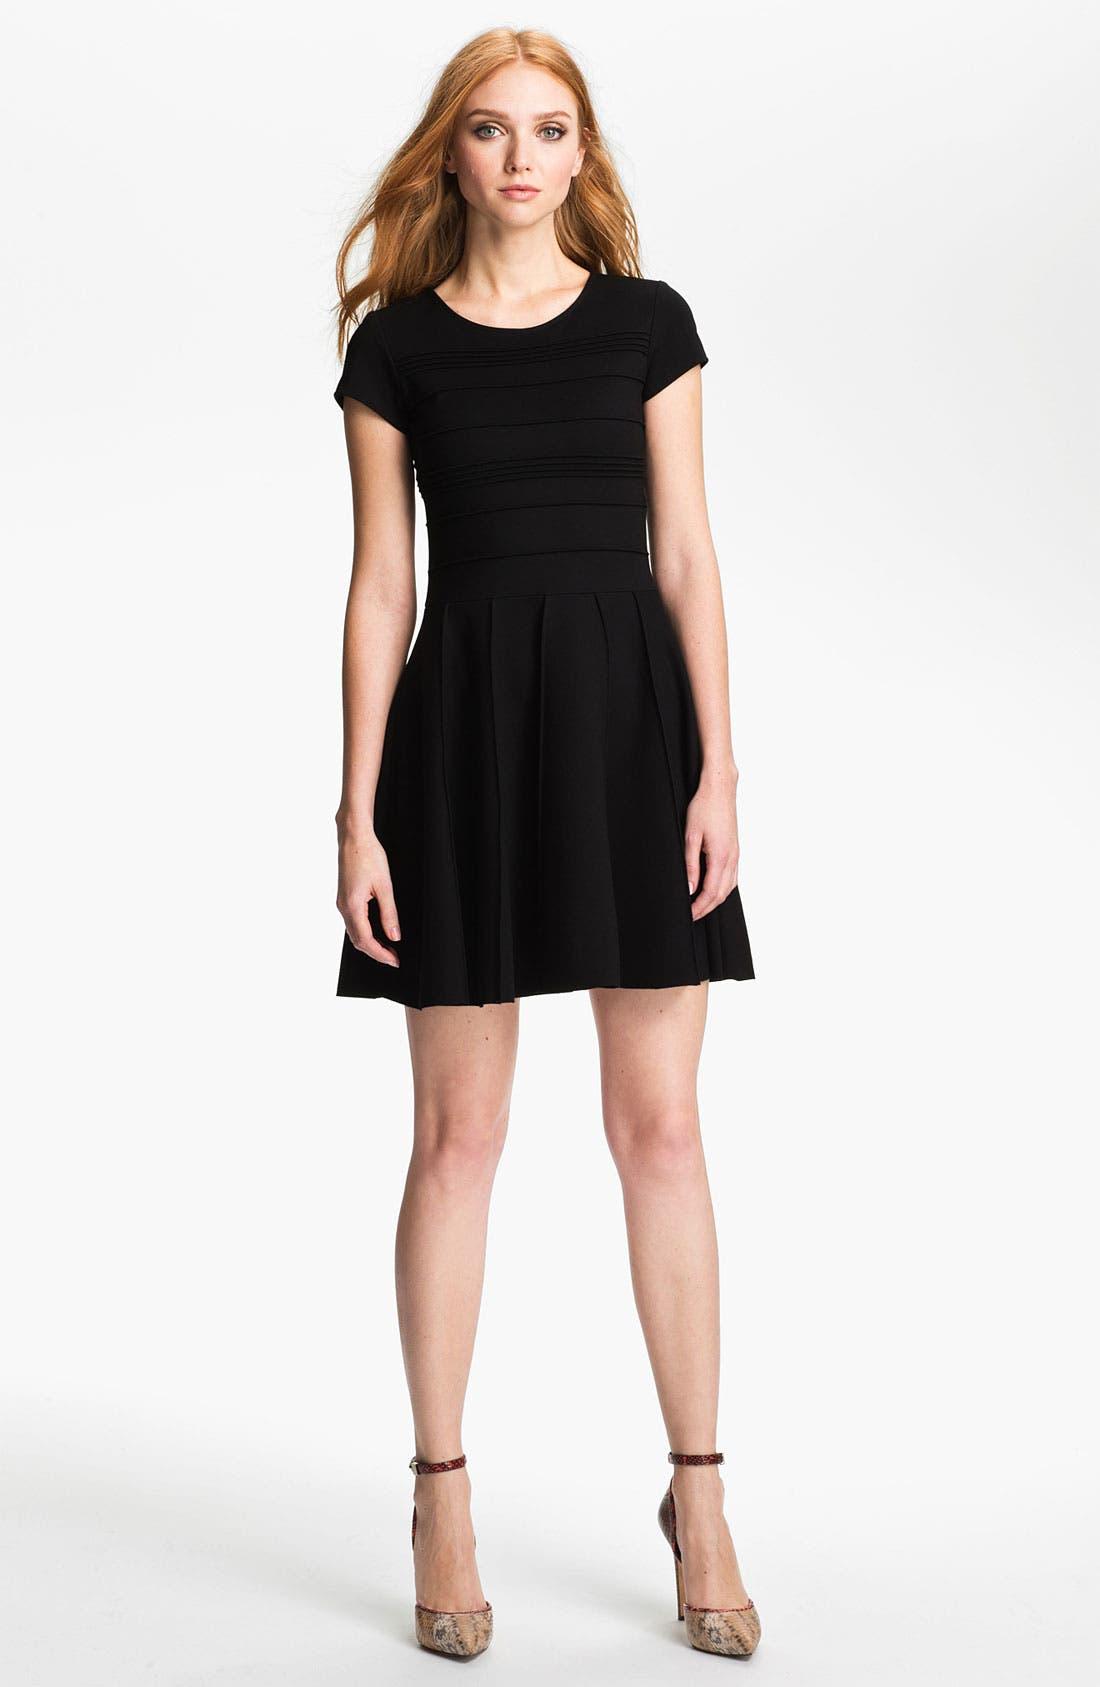 Alternate Image 1 Selected - Parker 'Tara' Stretch Fit & Flare Dress